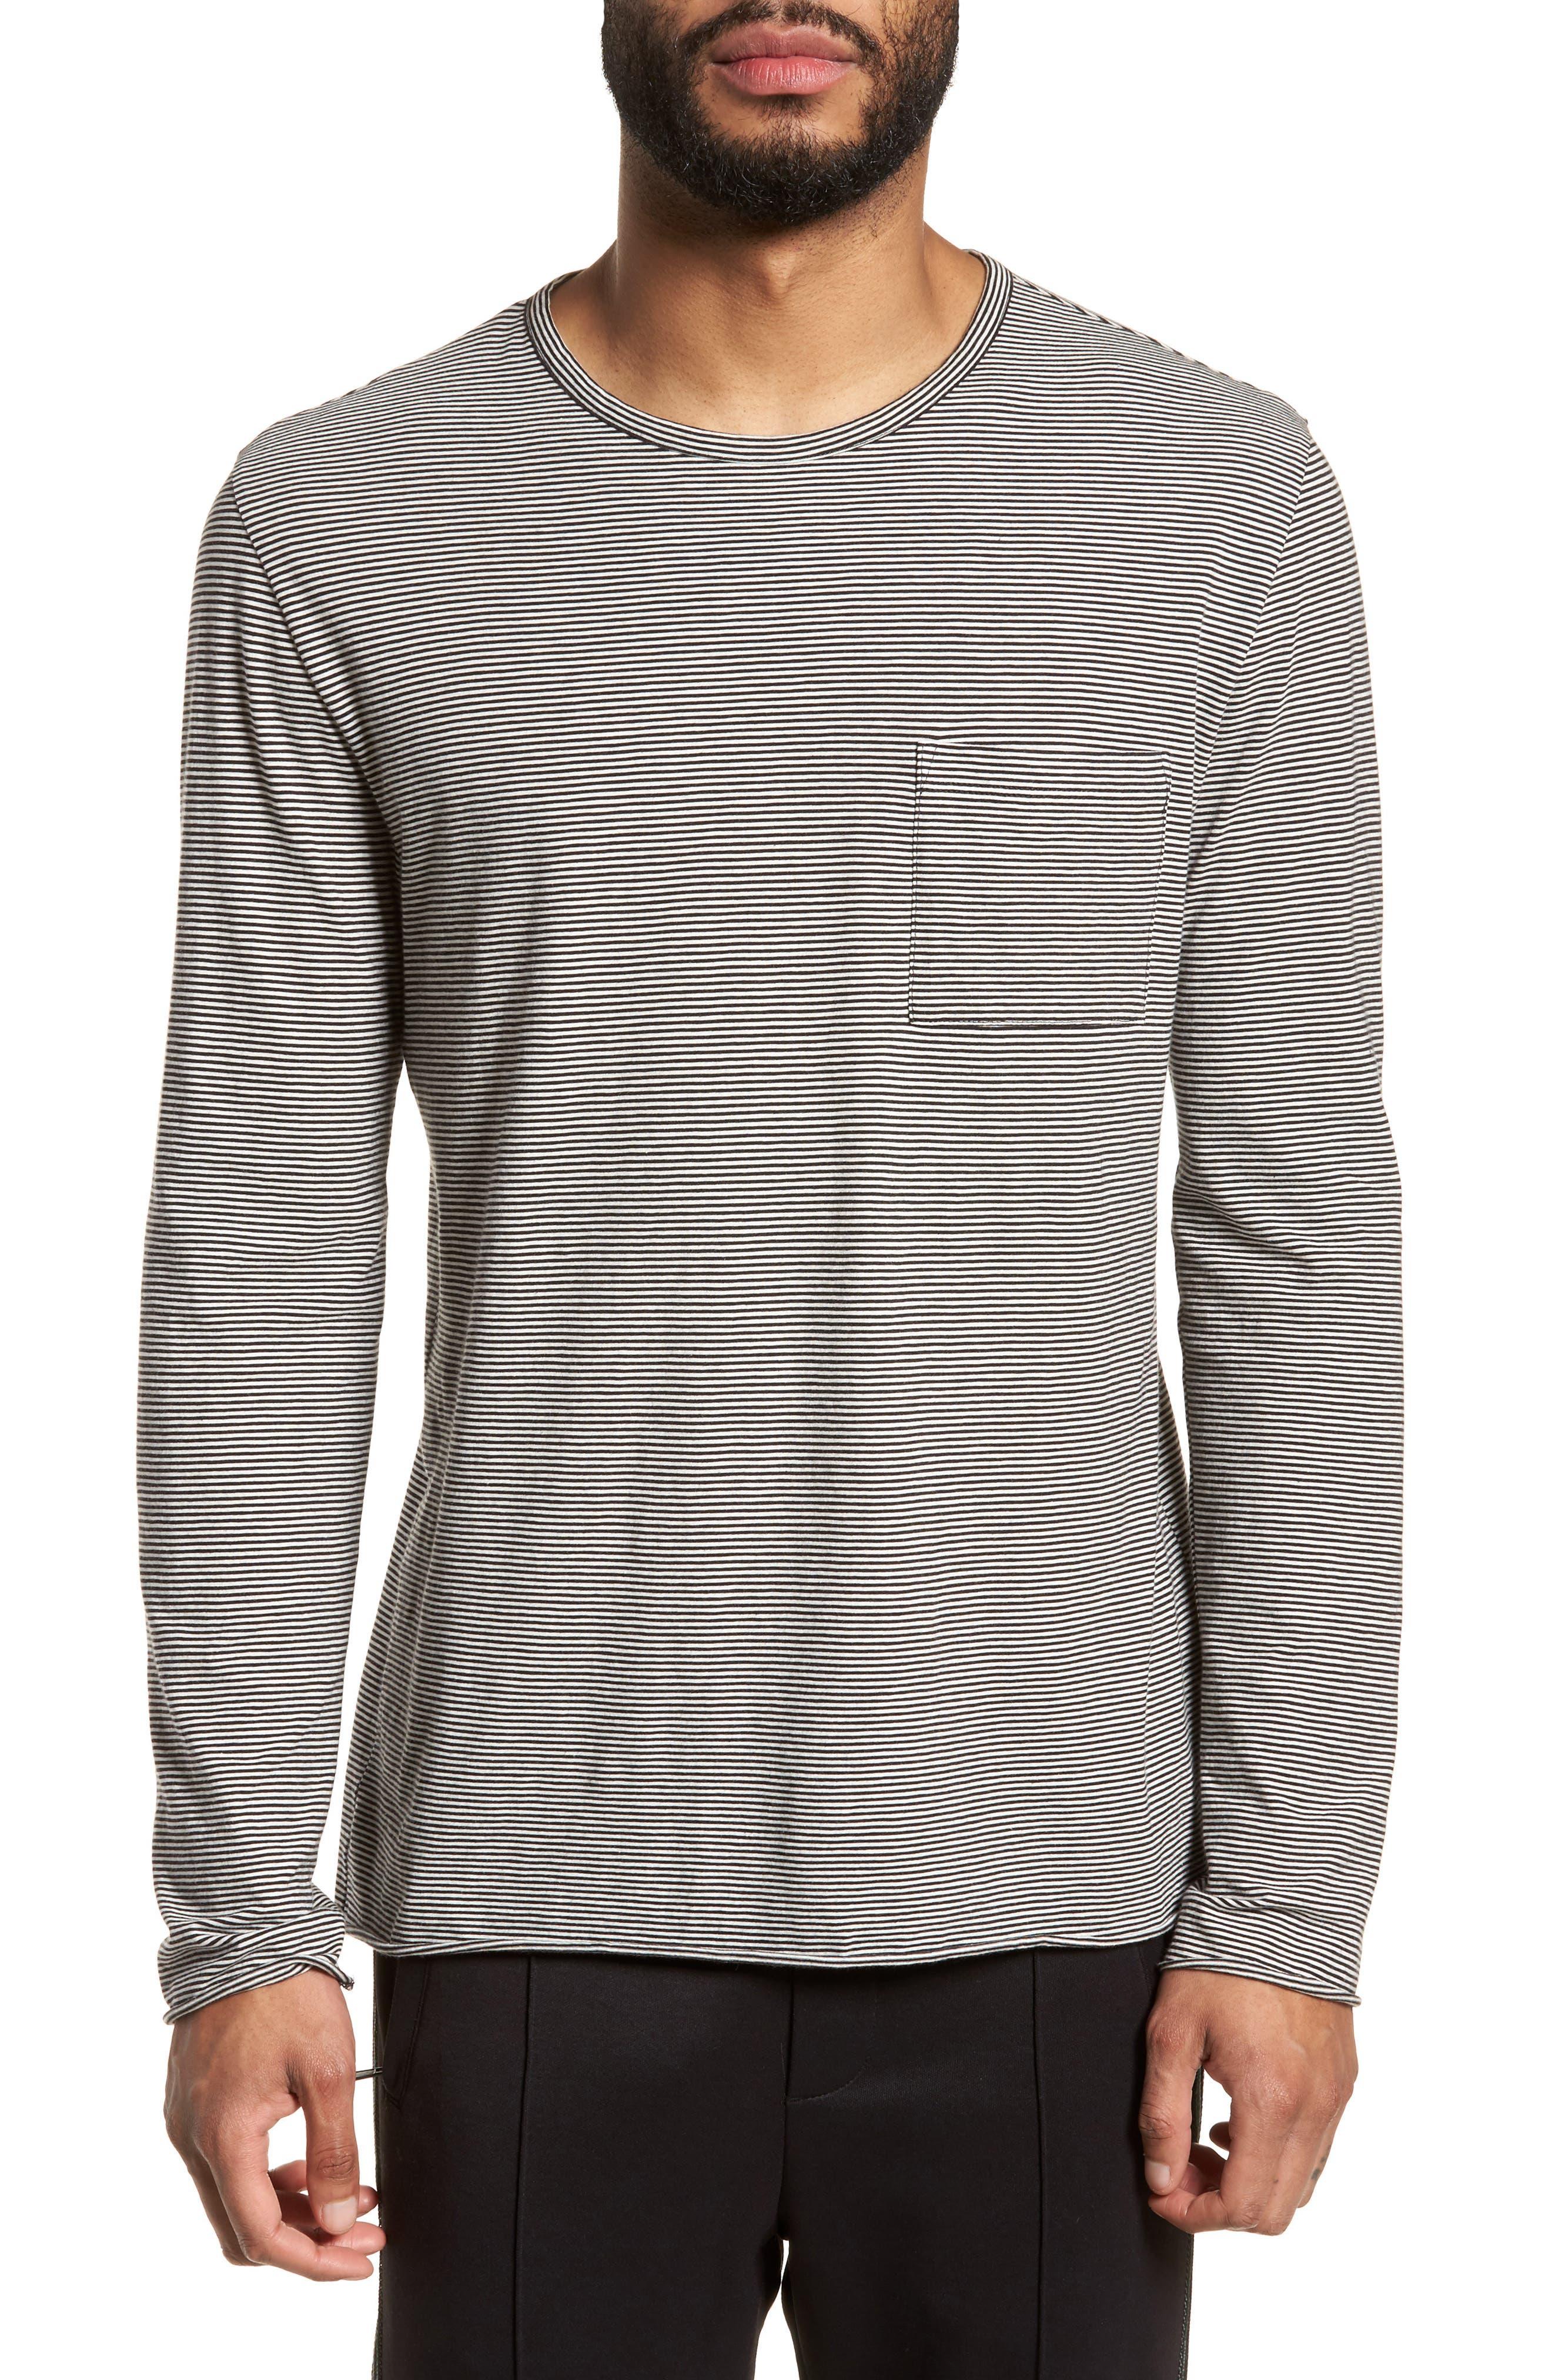 Feeder Stripe Long Sleeve Pocket T-Shirt,                             Main thumbnail 1, color,                             Black/ Leche